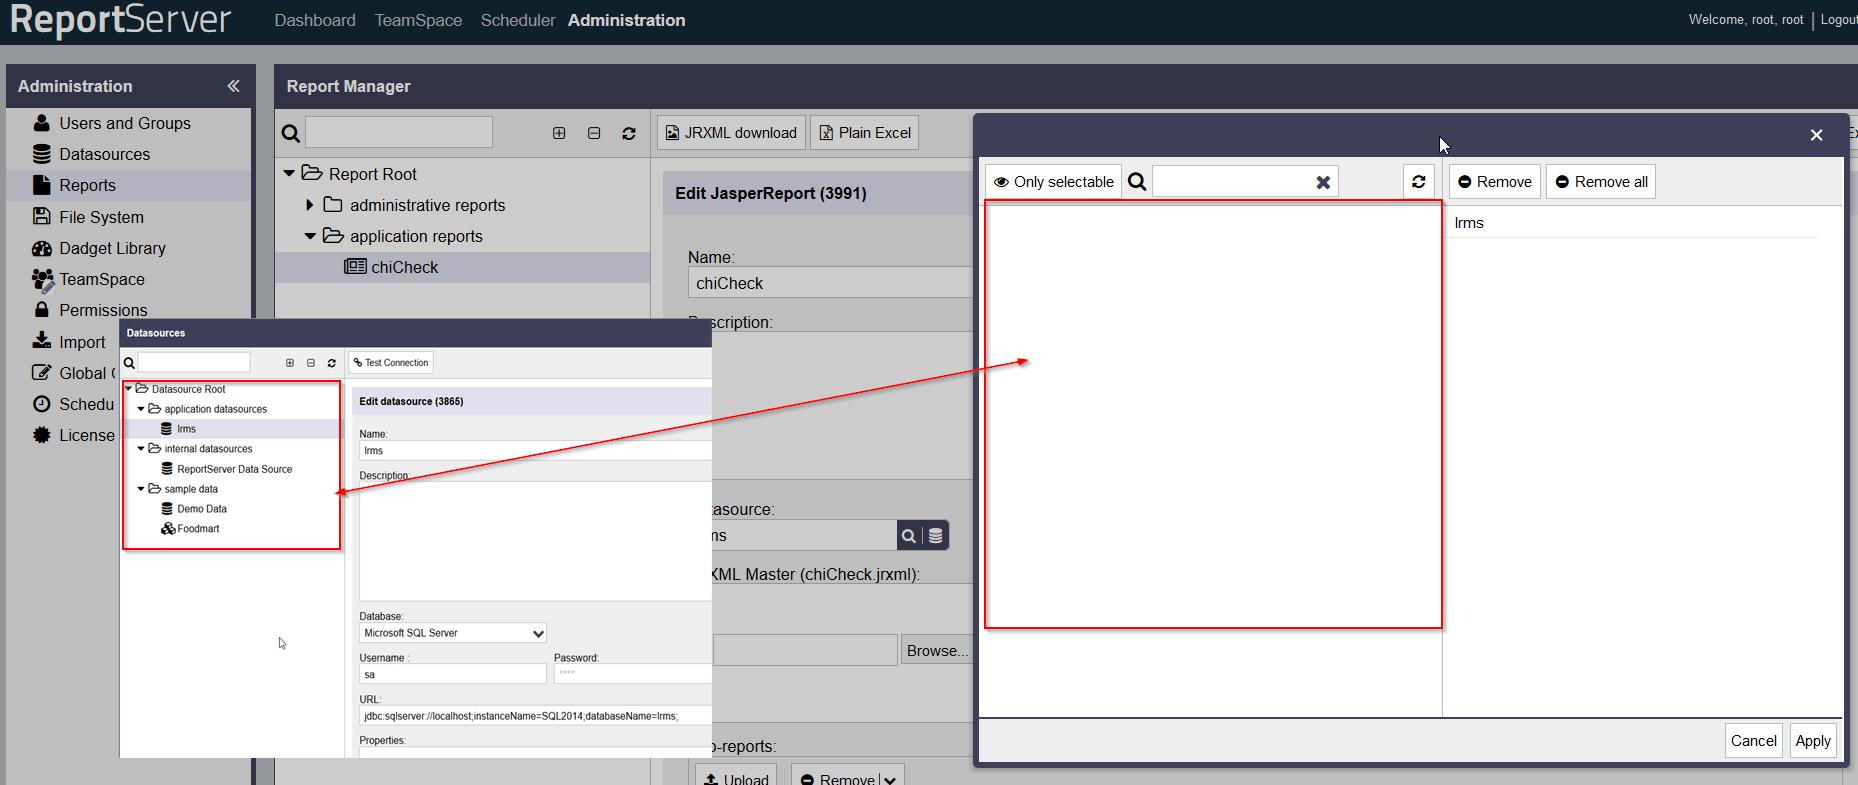 Deploys to JBoss EAP 7 1 5GA Error Found (Page 1